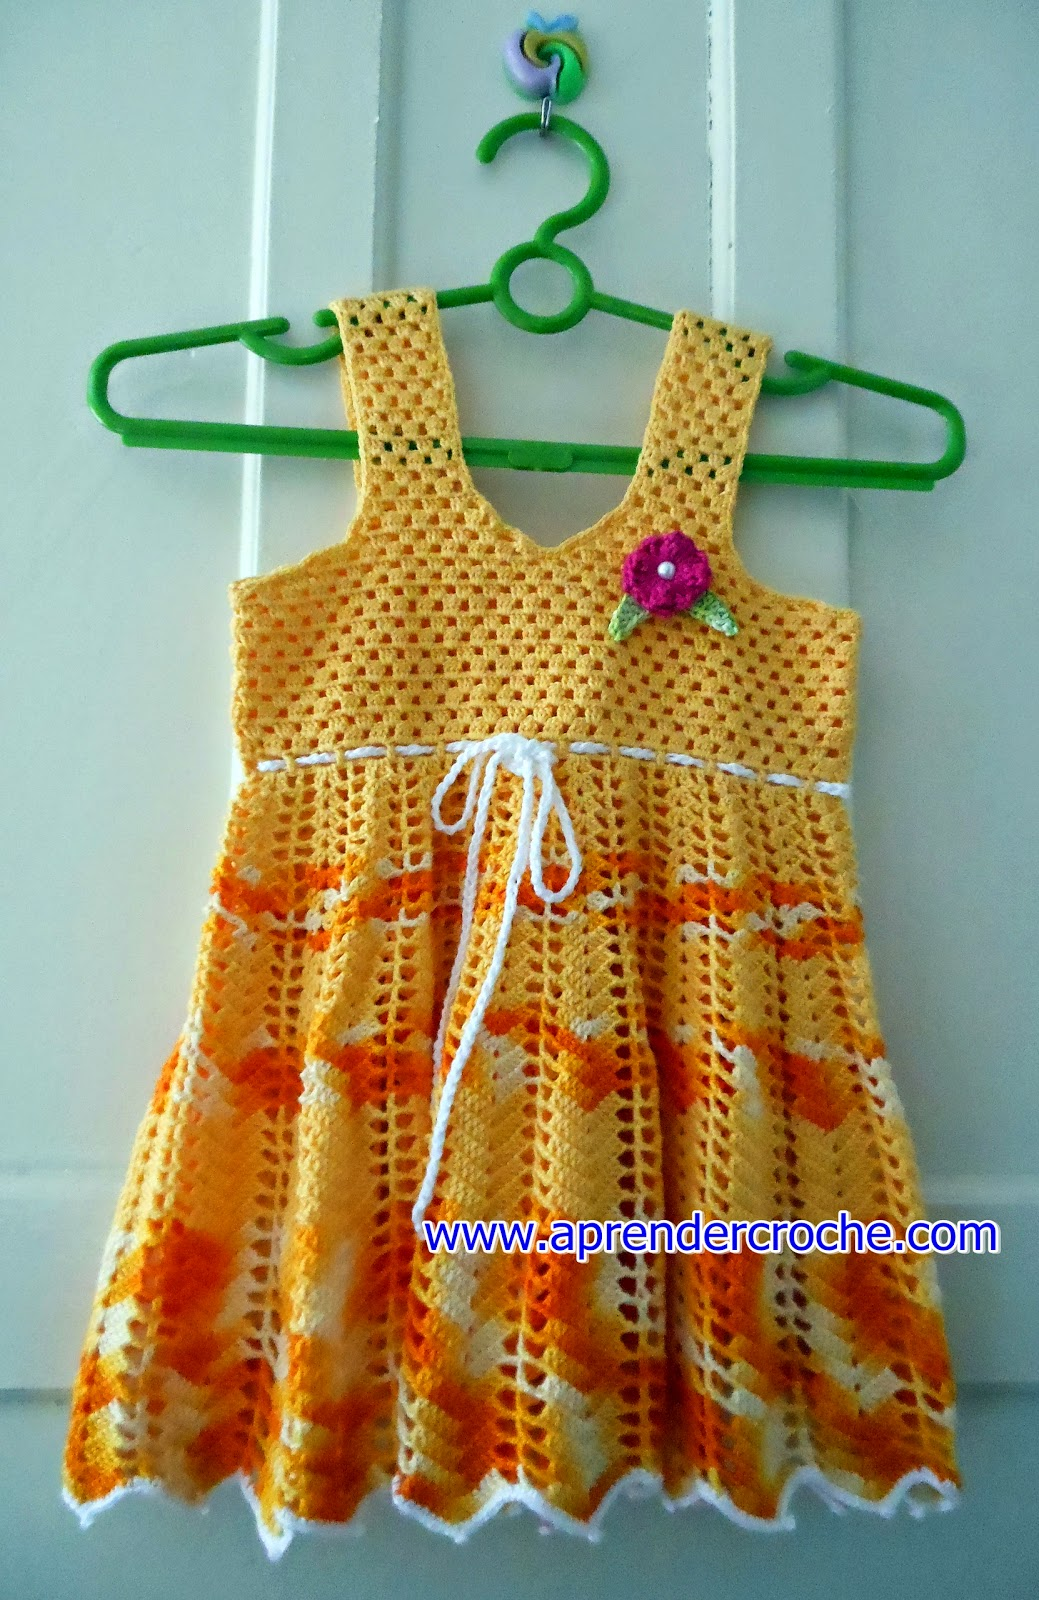 vestido aprender croche vestidinho bebê menina amarelo dvd video-aulas loja curso de croche edinir-croche